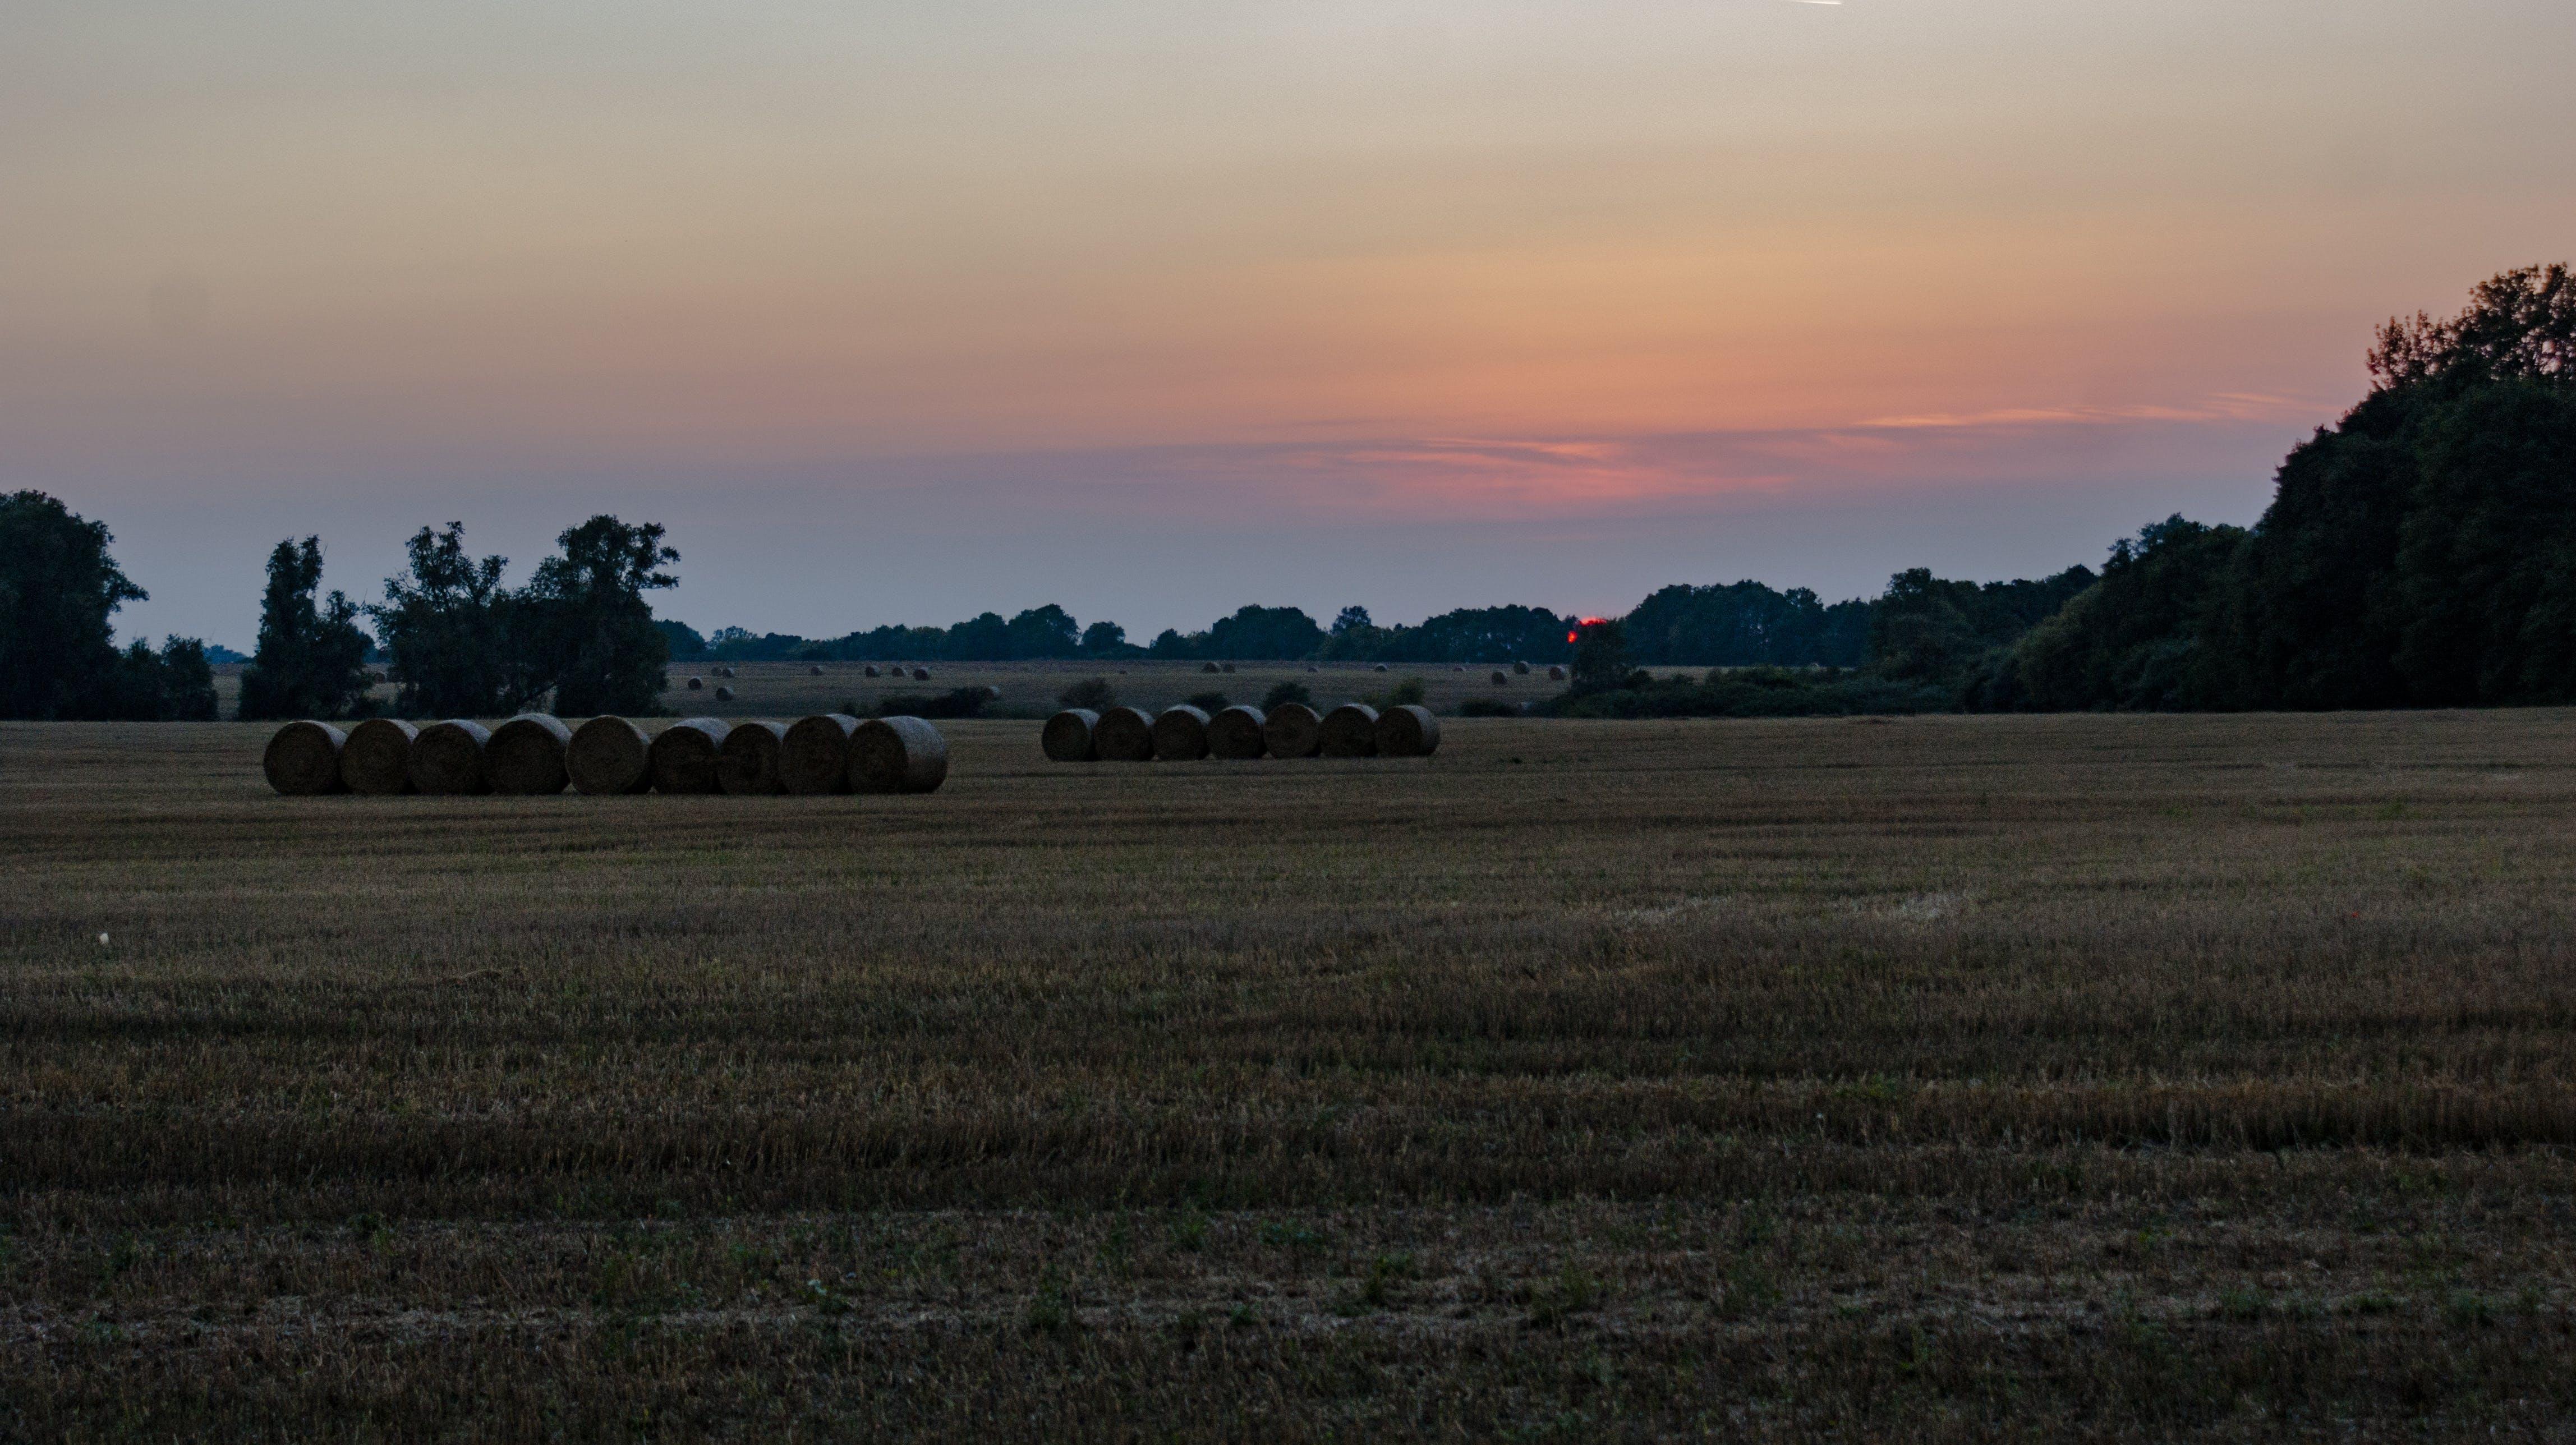 Free stock photo of hay bales, landscape, sunset